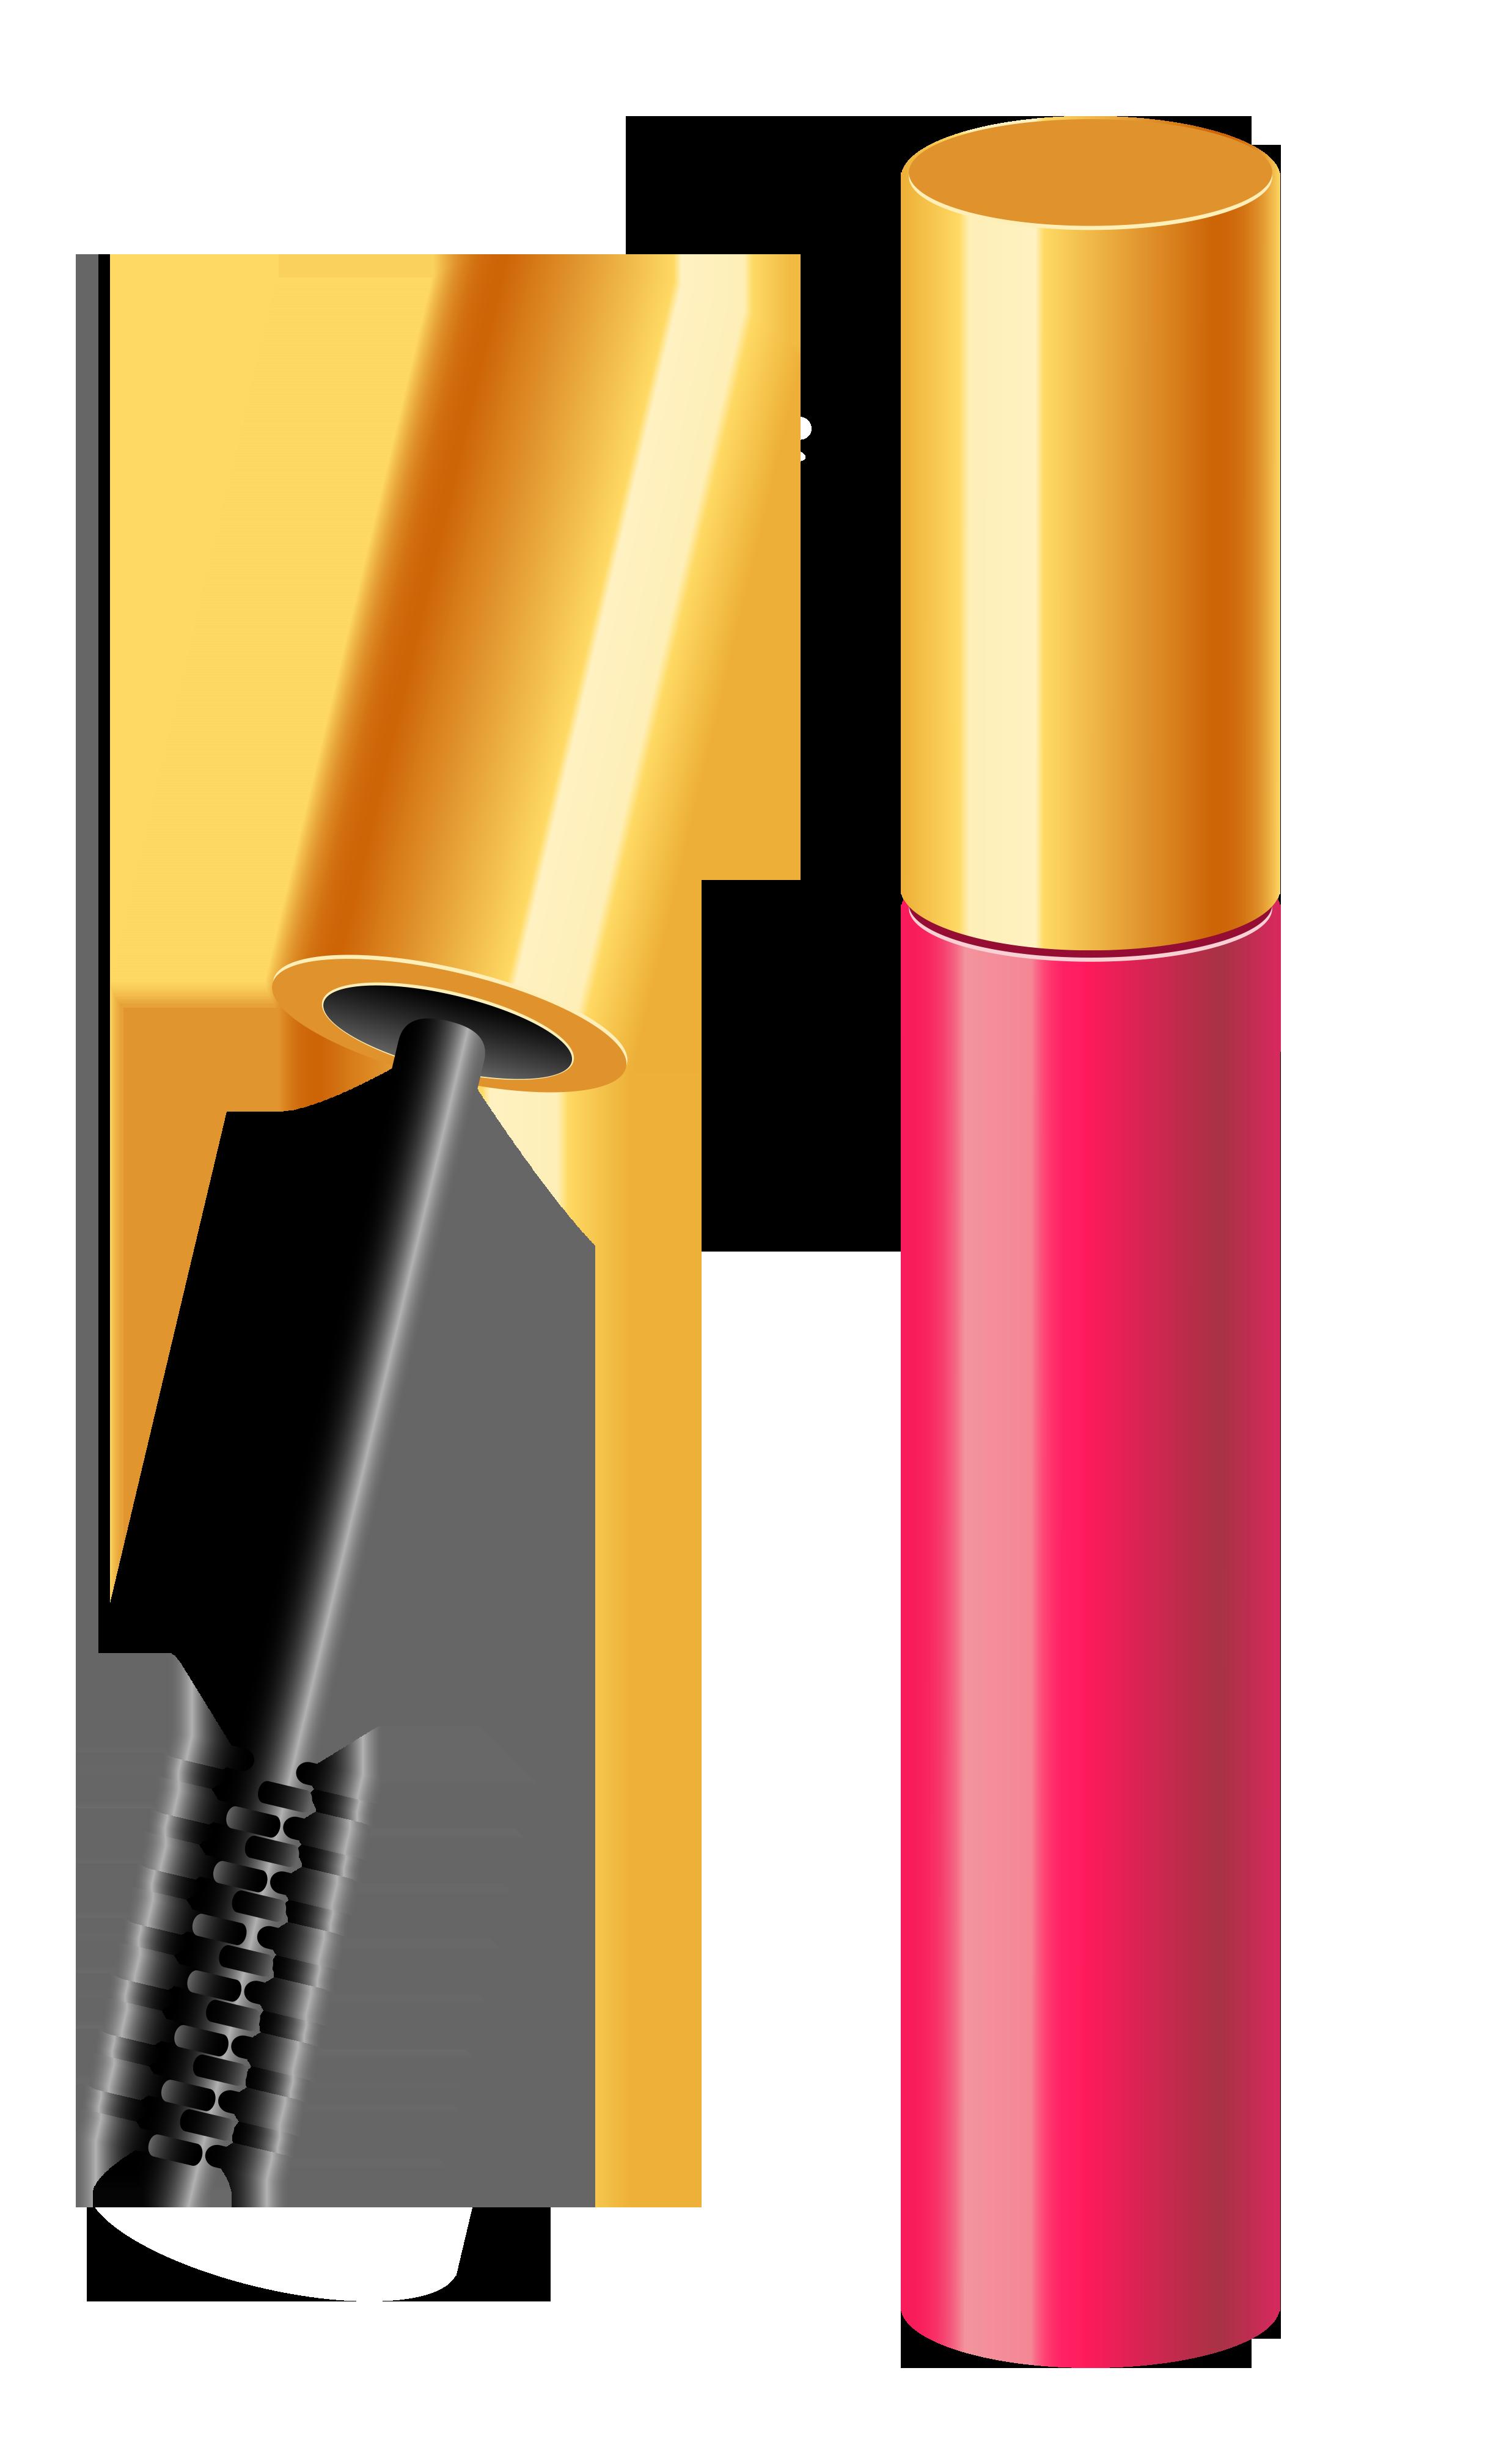 Mascara png image gallery. Frame clipart makeup